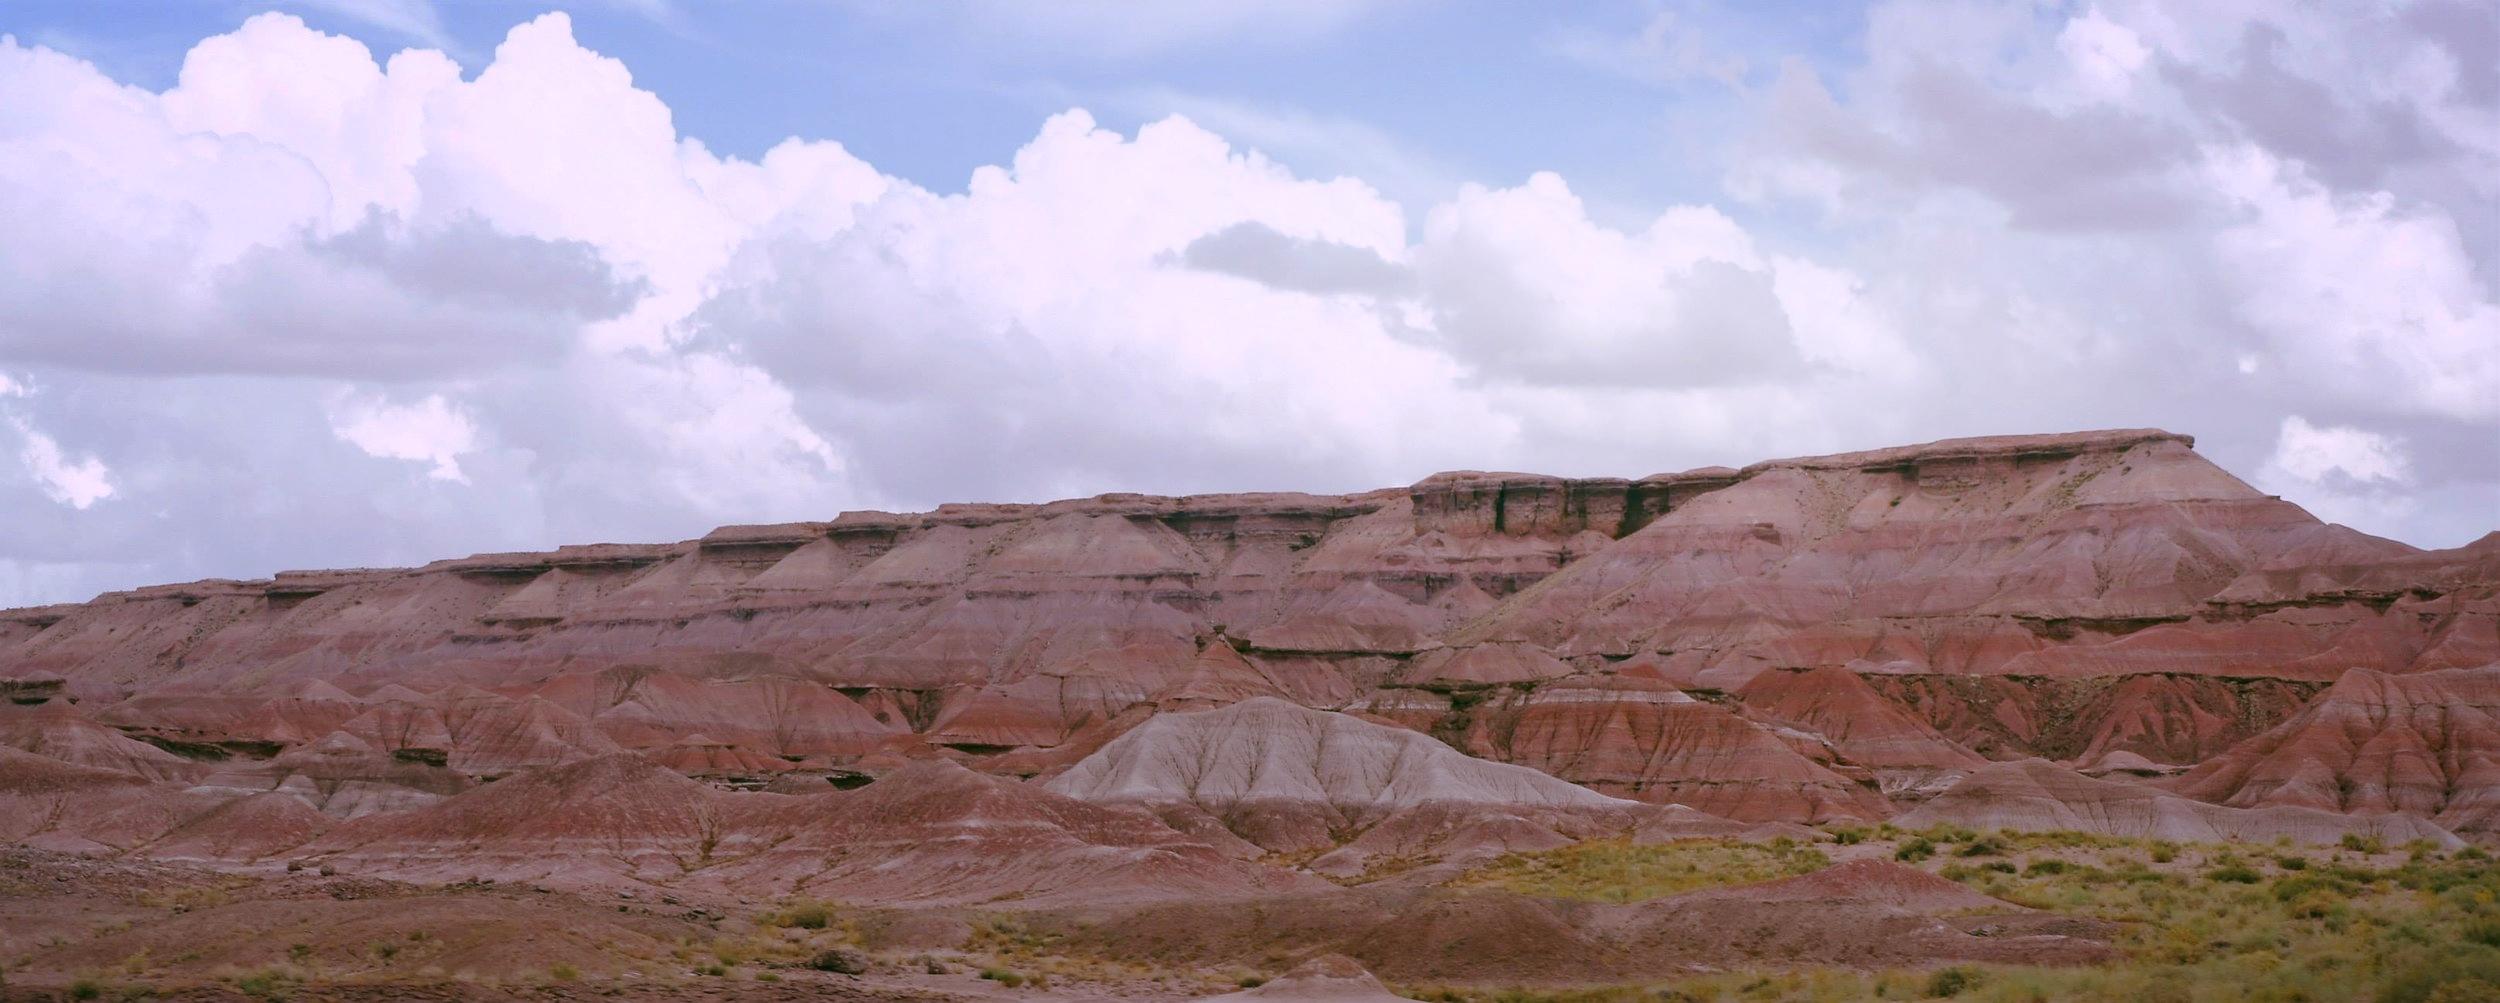 Red Rock Ridges